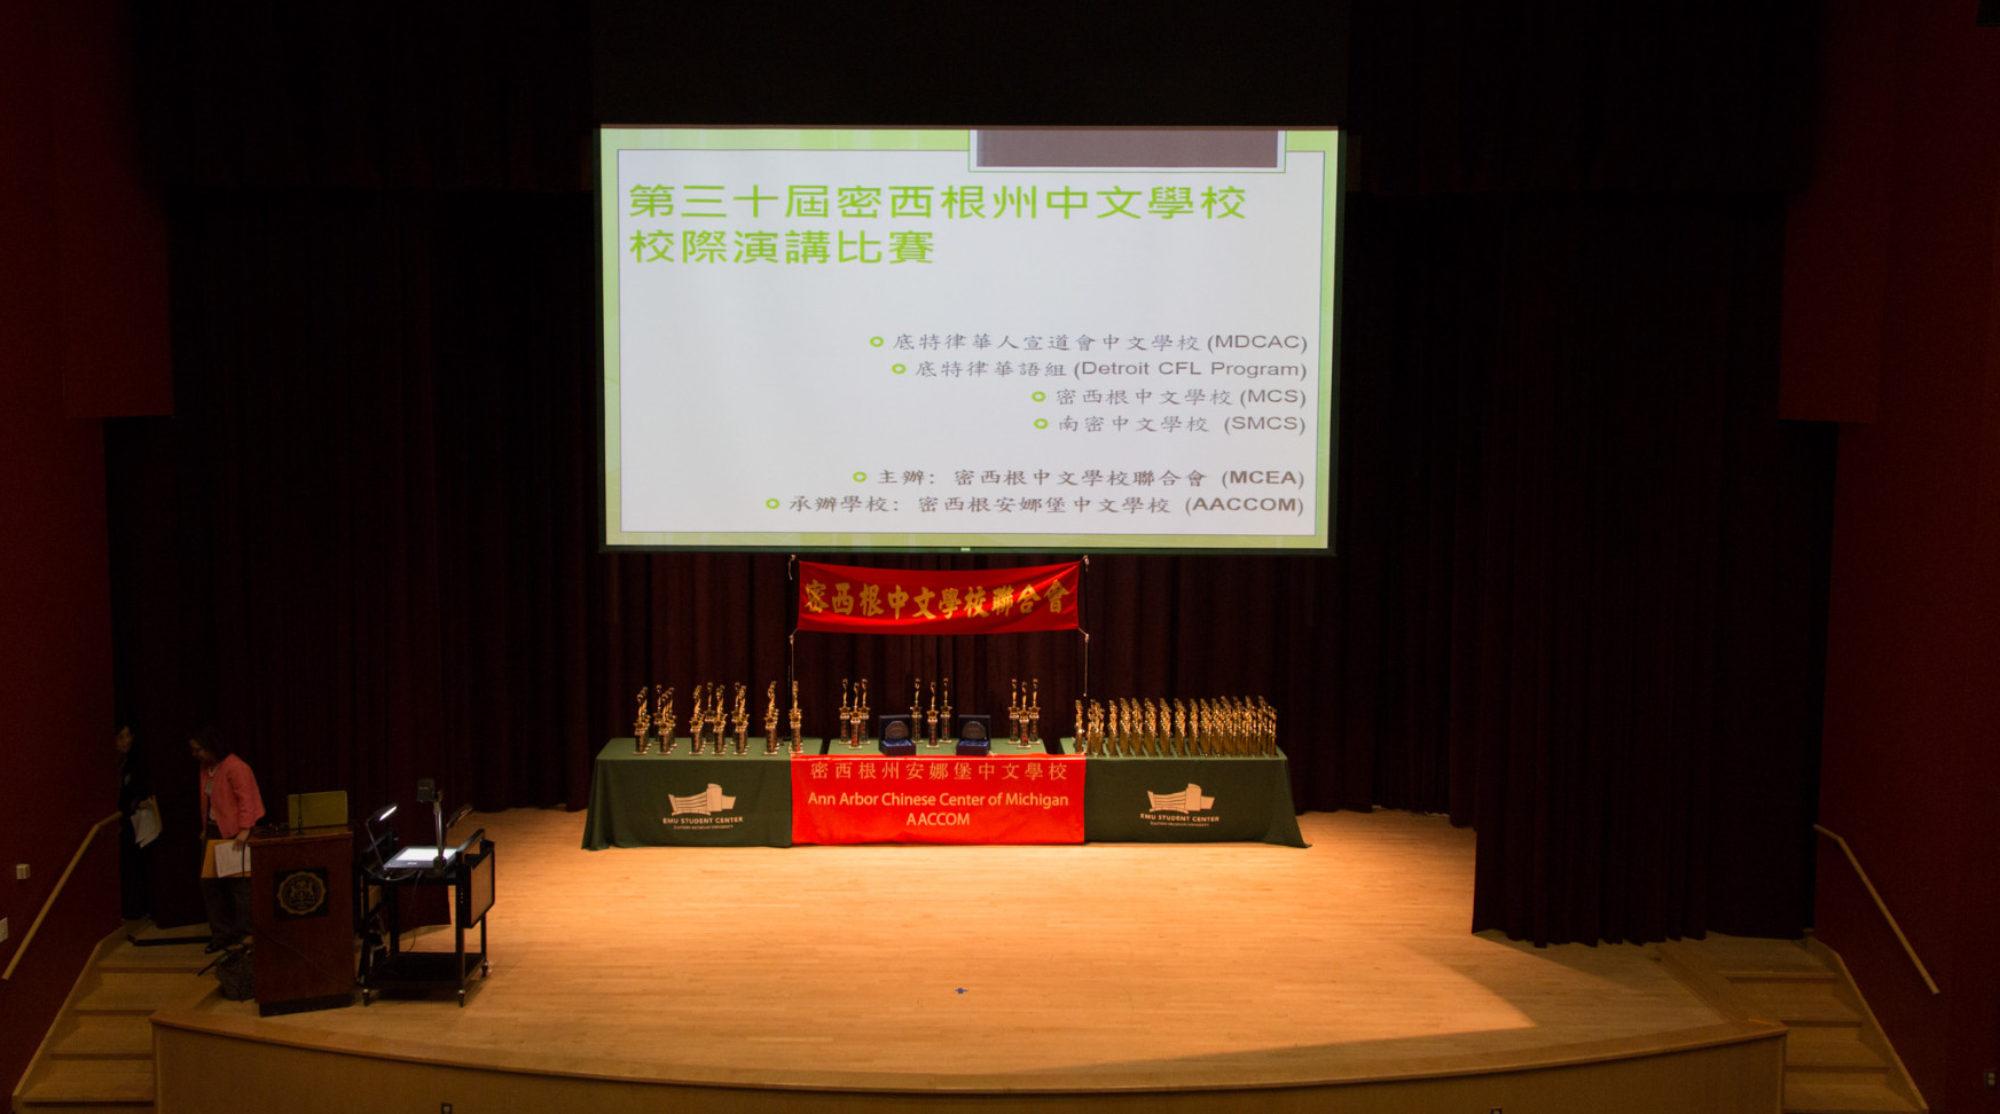 Ann Arbor Chinese School (AACCOM)